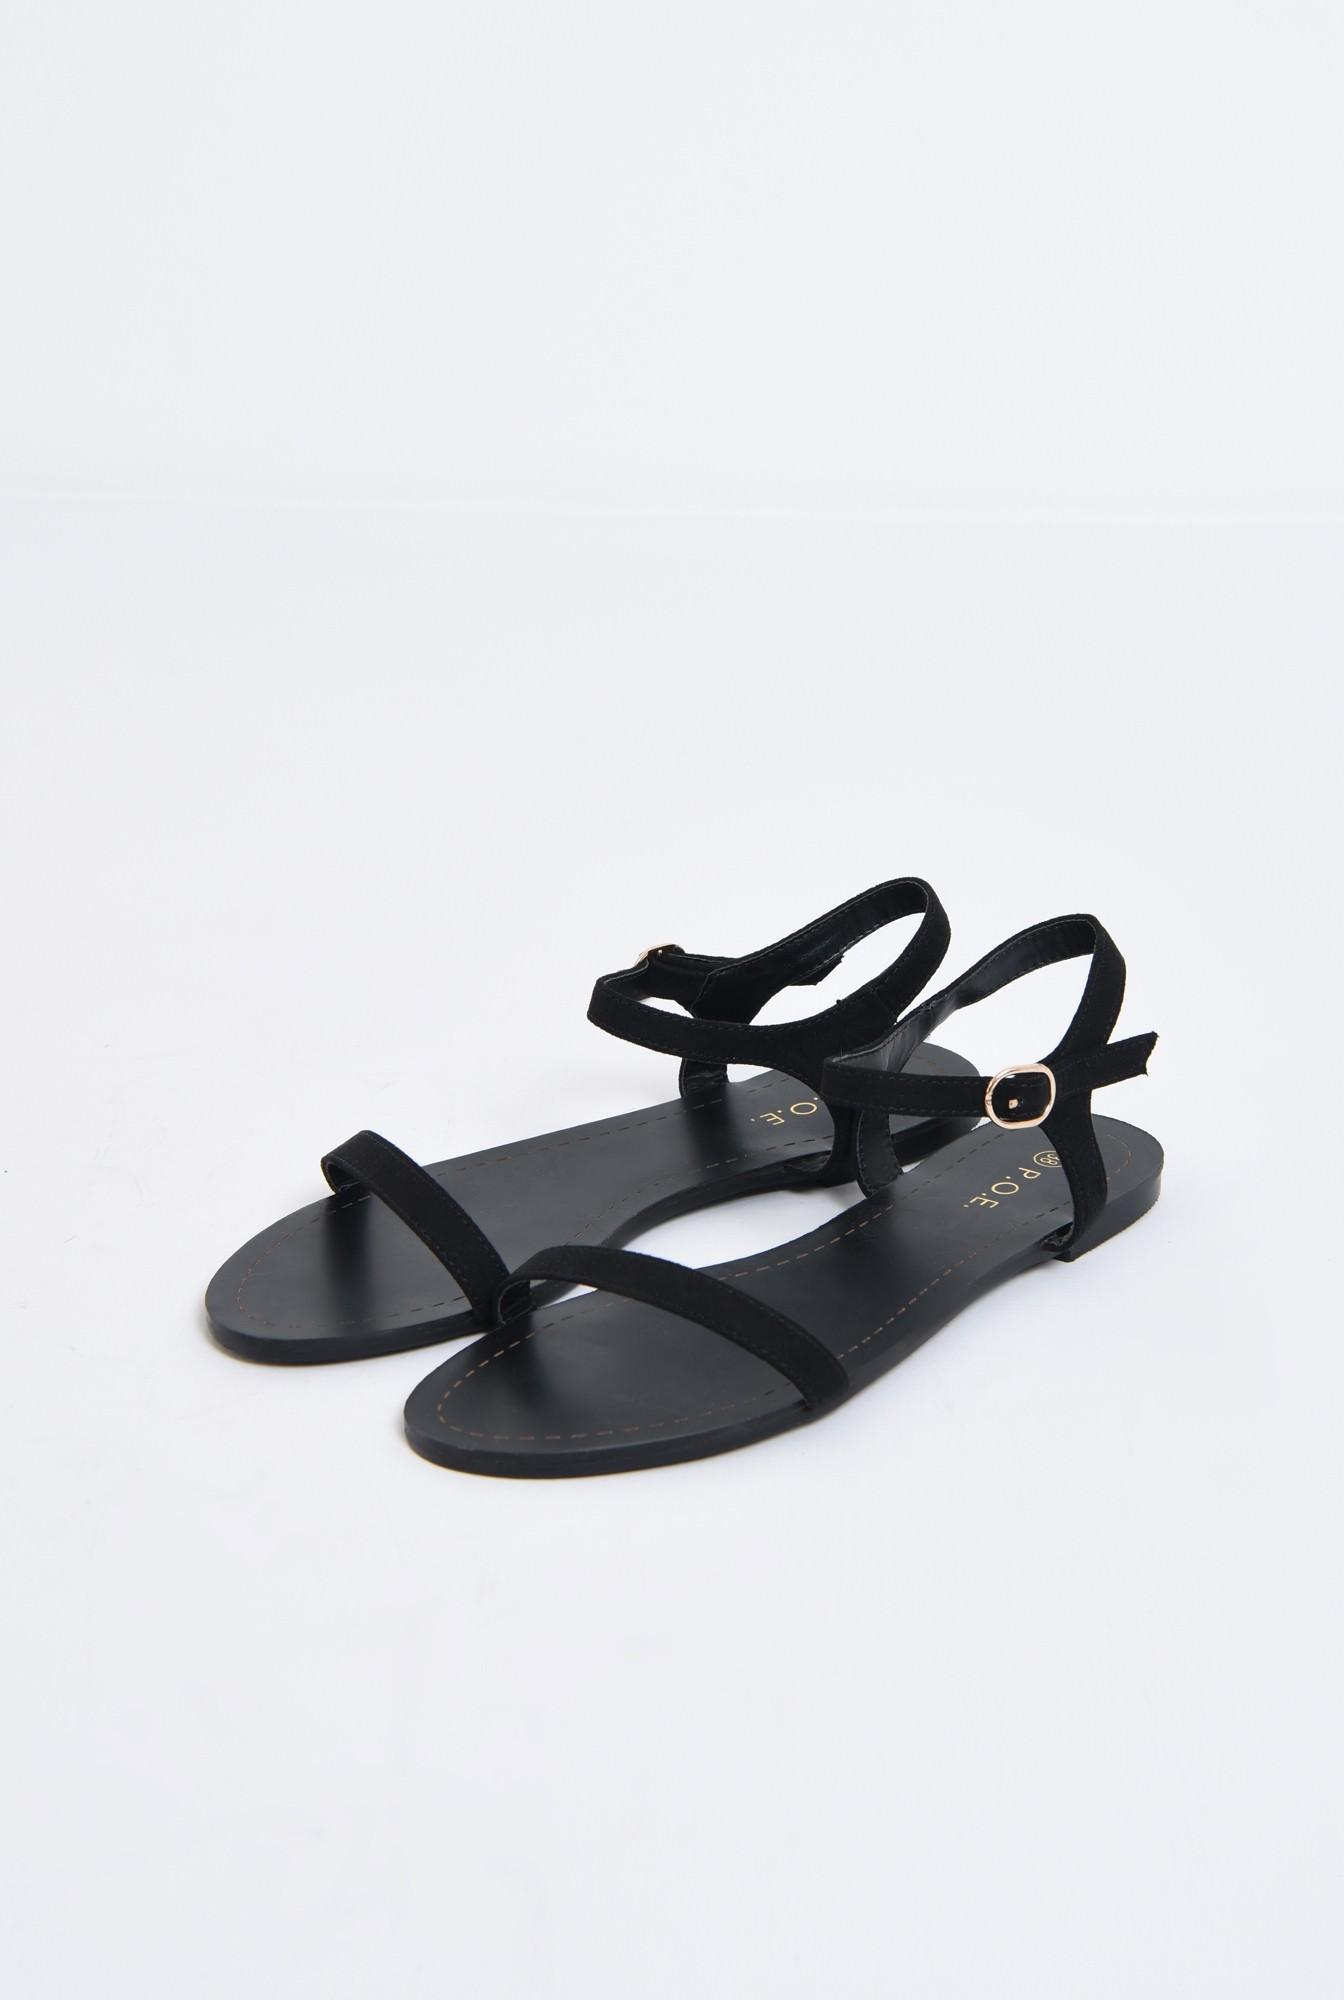 1 - sandale casual, negre, din velur, fara toc